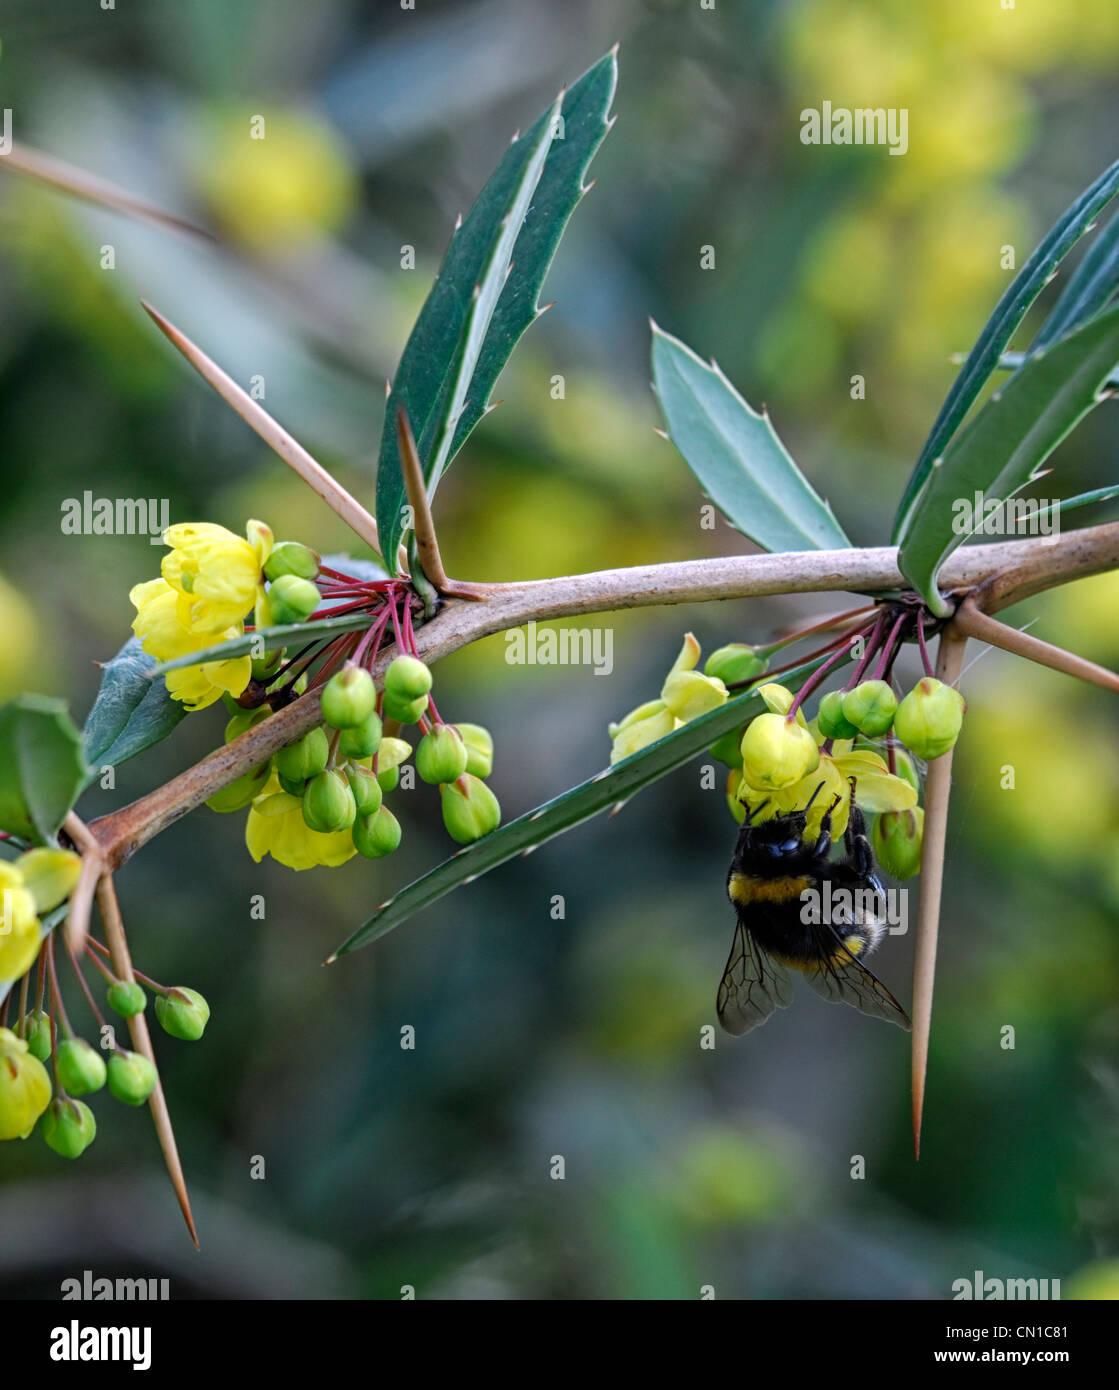 Berberis Pruinosa Printemps Jaune Fleurs Arbustes Coniferes Plantes